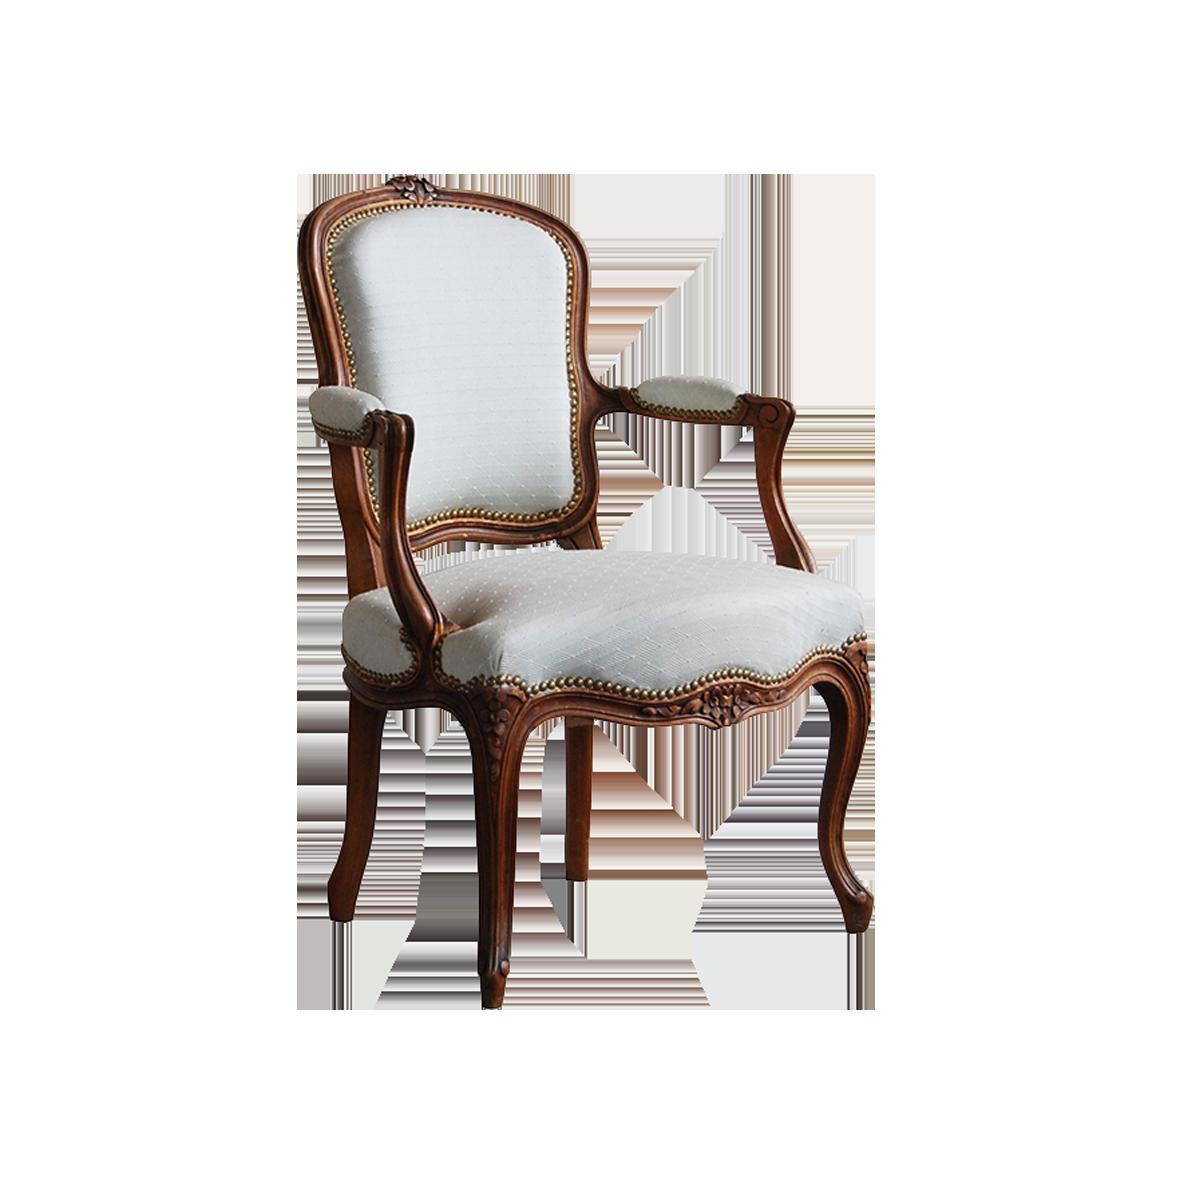 Chaise Salle A Manger Louis Xv fauteuil salon louis xv 145 - pierre counot blandin